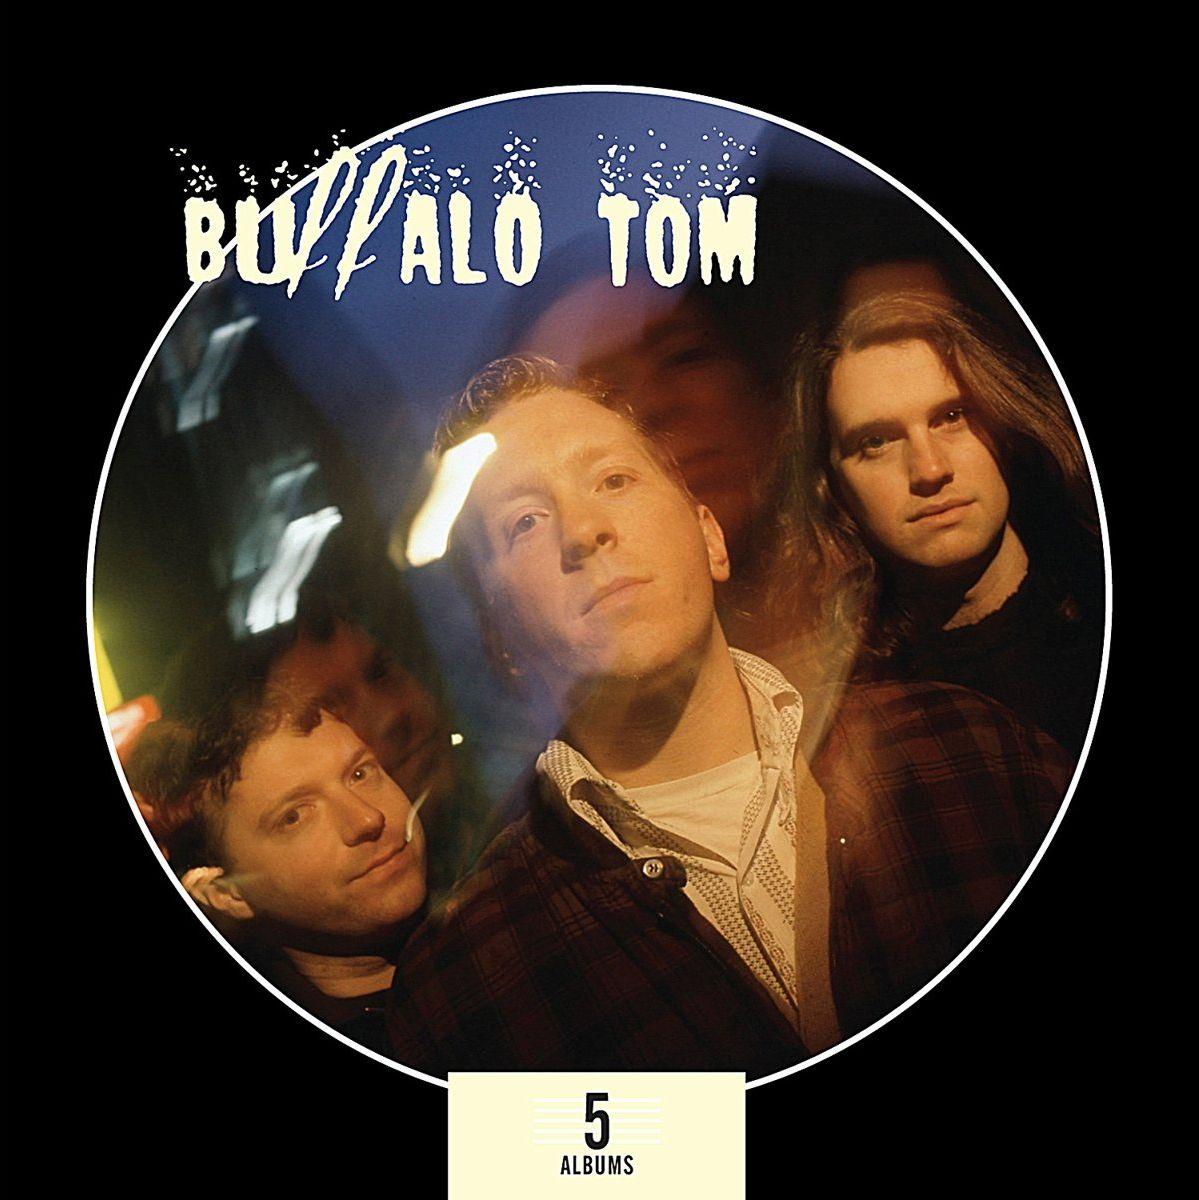 лучшая цена Buffalo Tom Buffalo Tom. 5 Albums (5 CD)